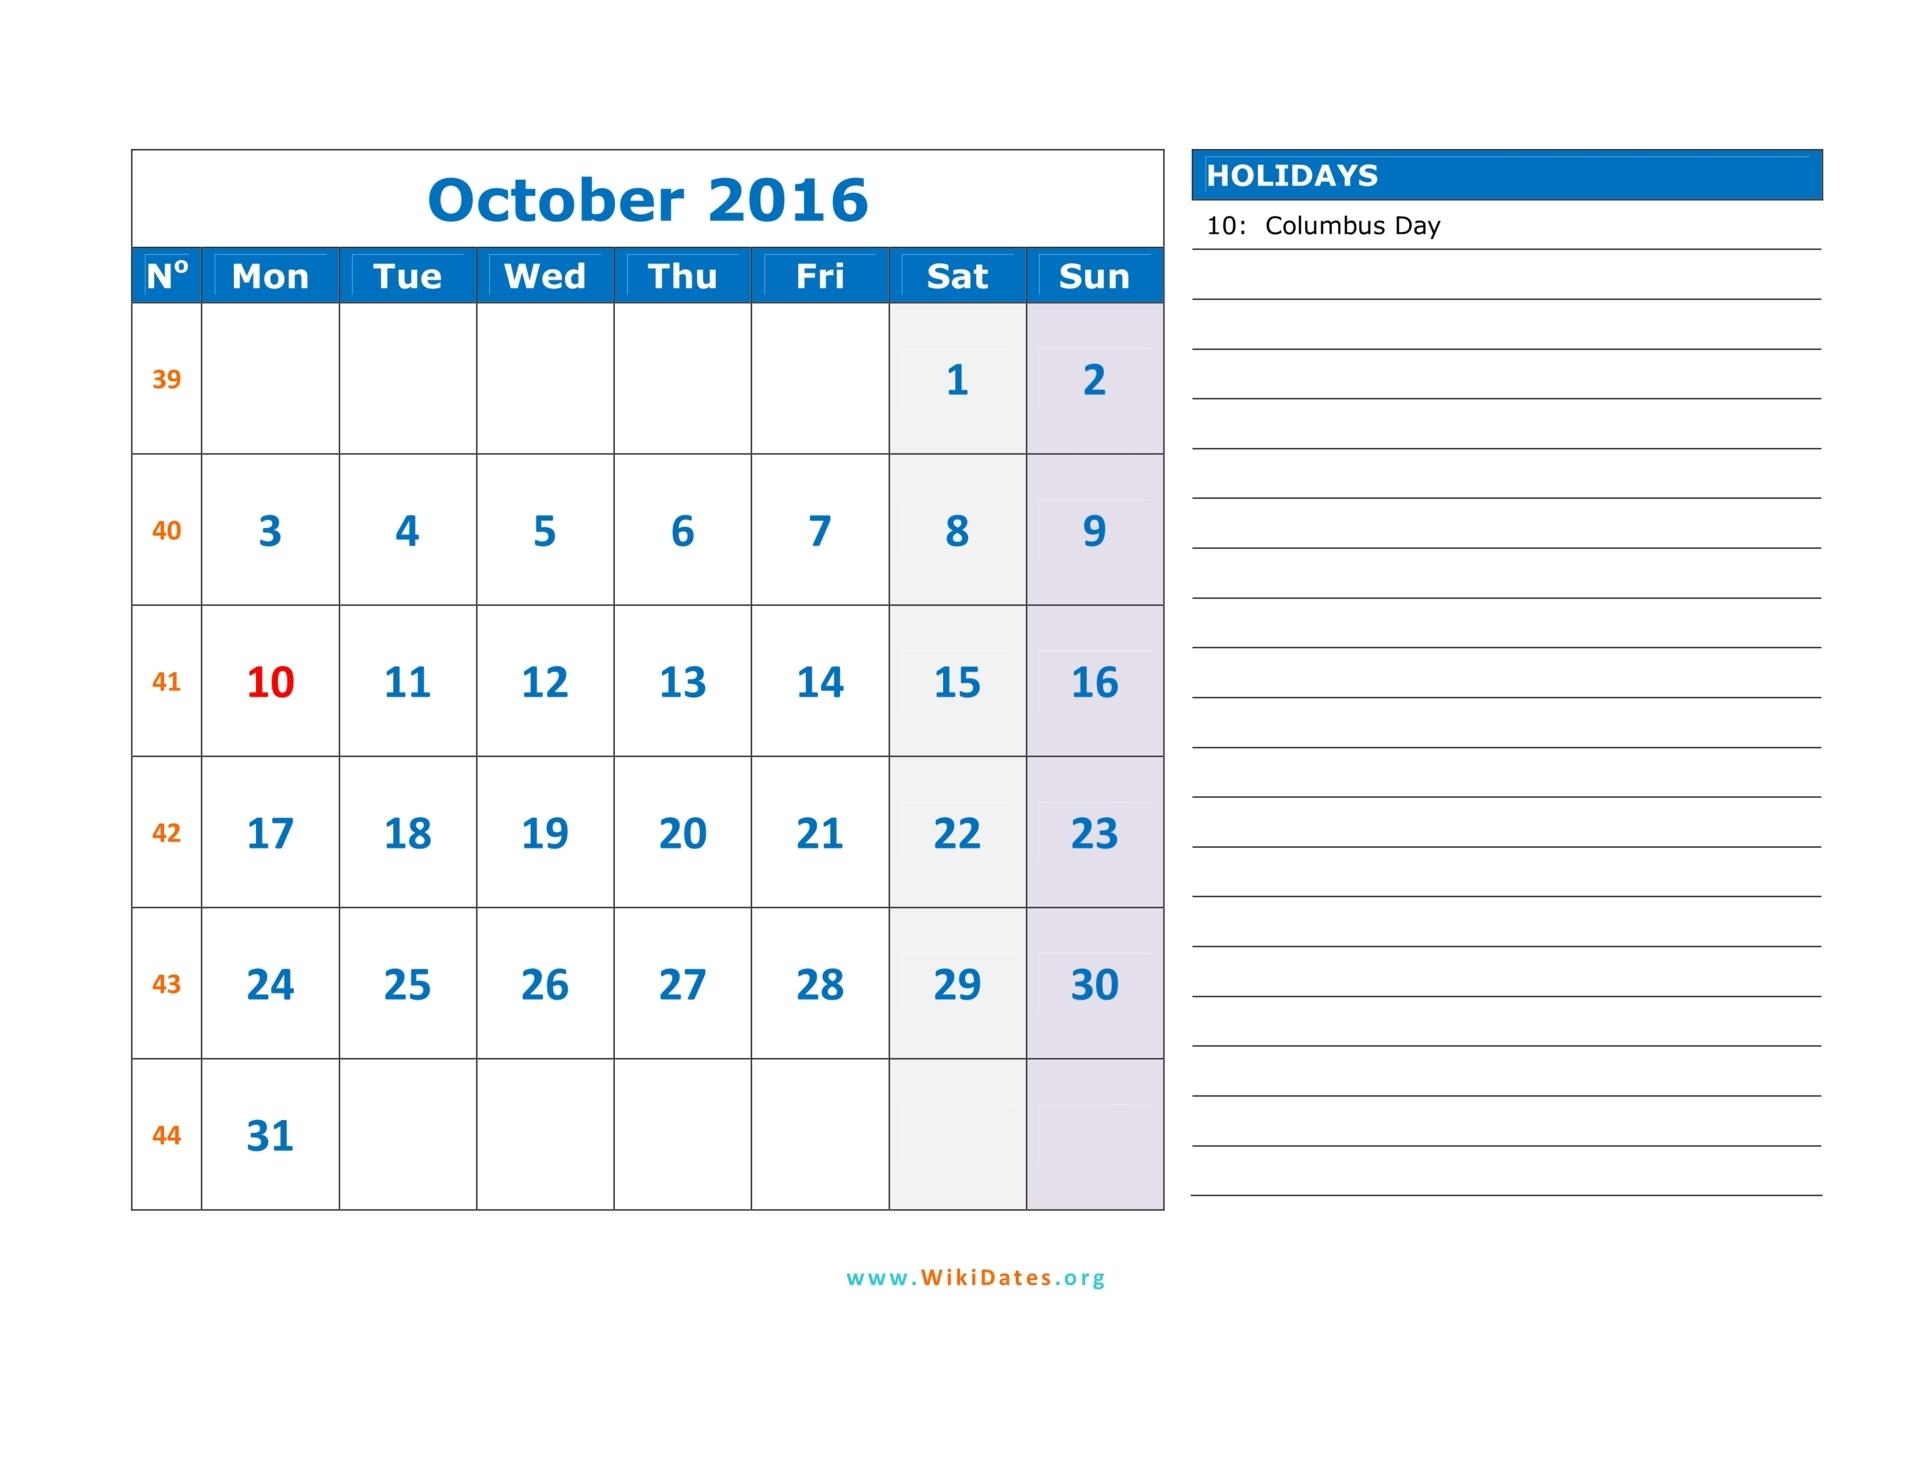 October 2016 Calendar   WikiDates.org